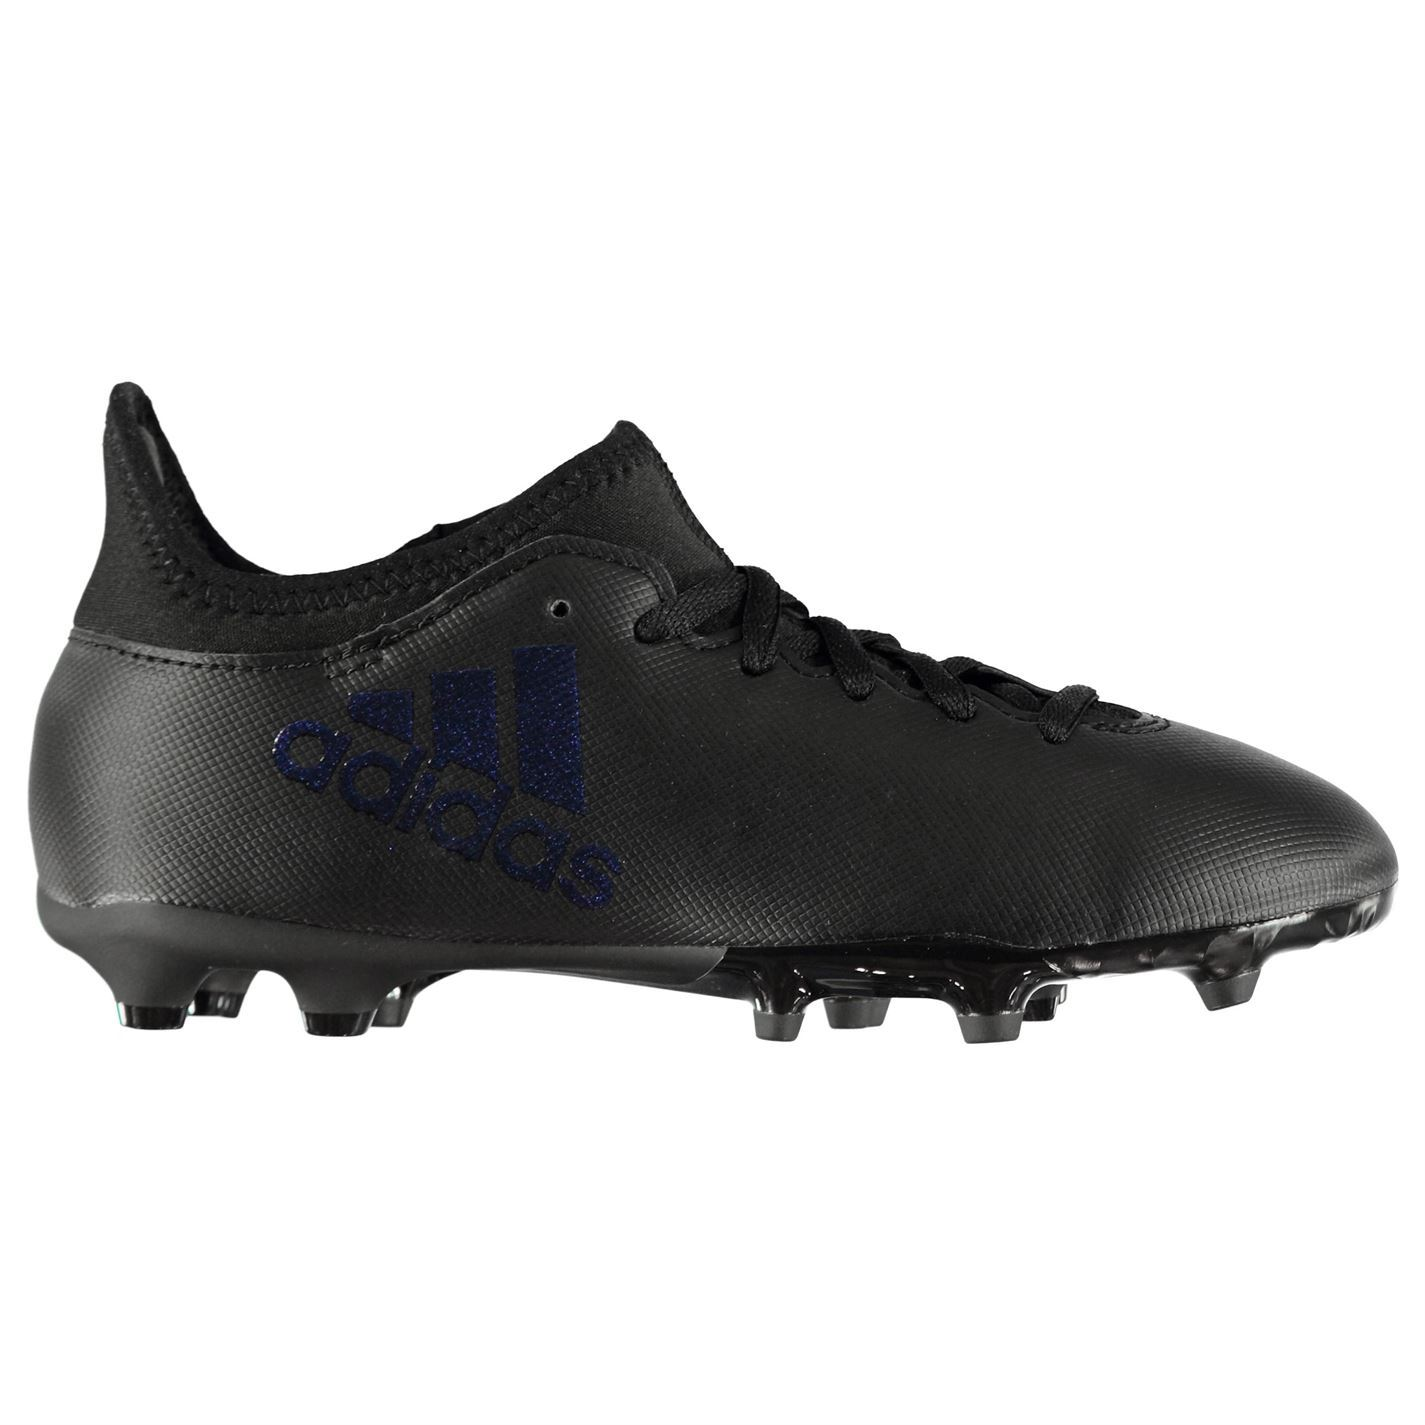 adidas X 16.3 FG Firm Ground Football Boots Juniors Black Soccer Shoes  Cleats 76d3dd7ca